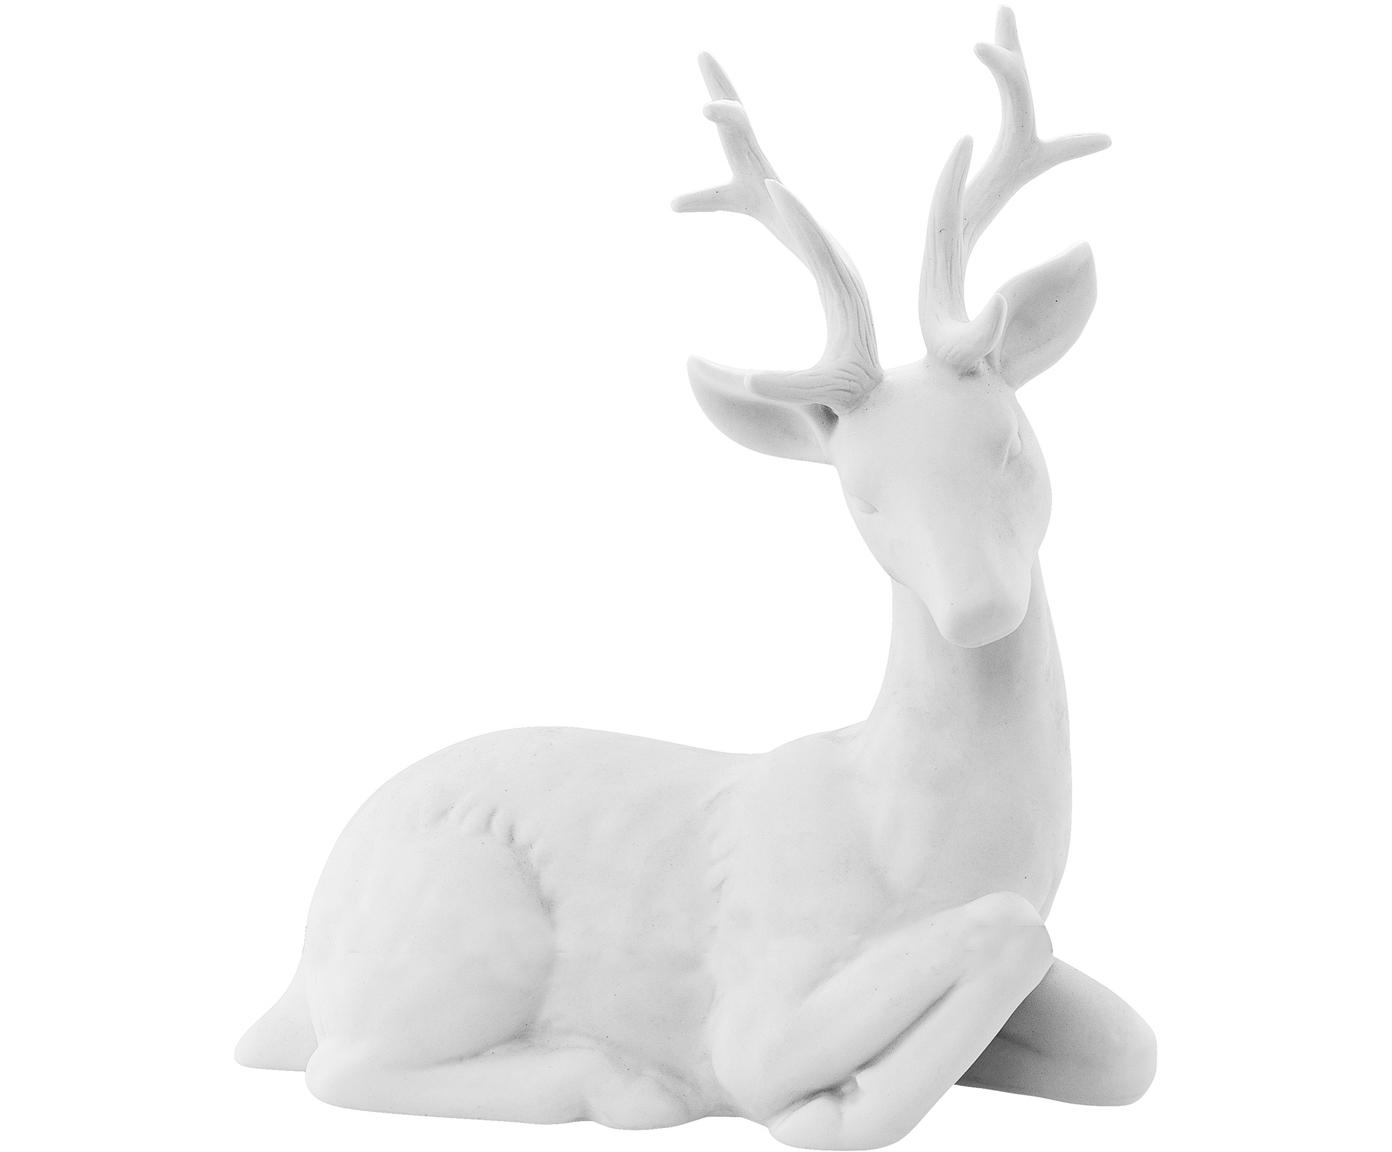 Oggetto decorativo Reindeer, Porcellana, Bianco, Larg. 19 x Alt. 22 cm